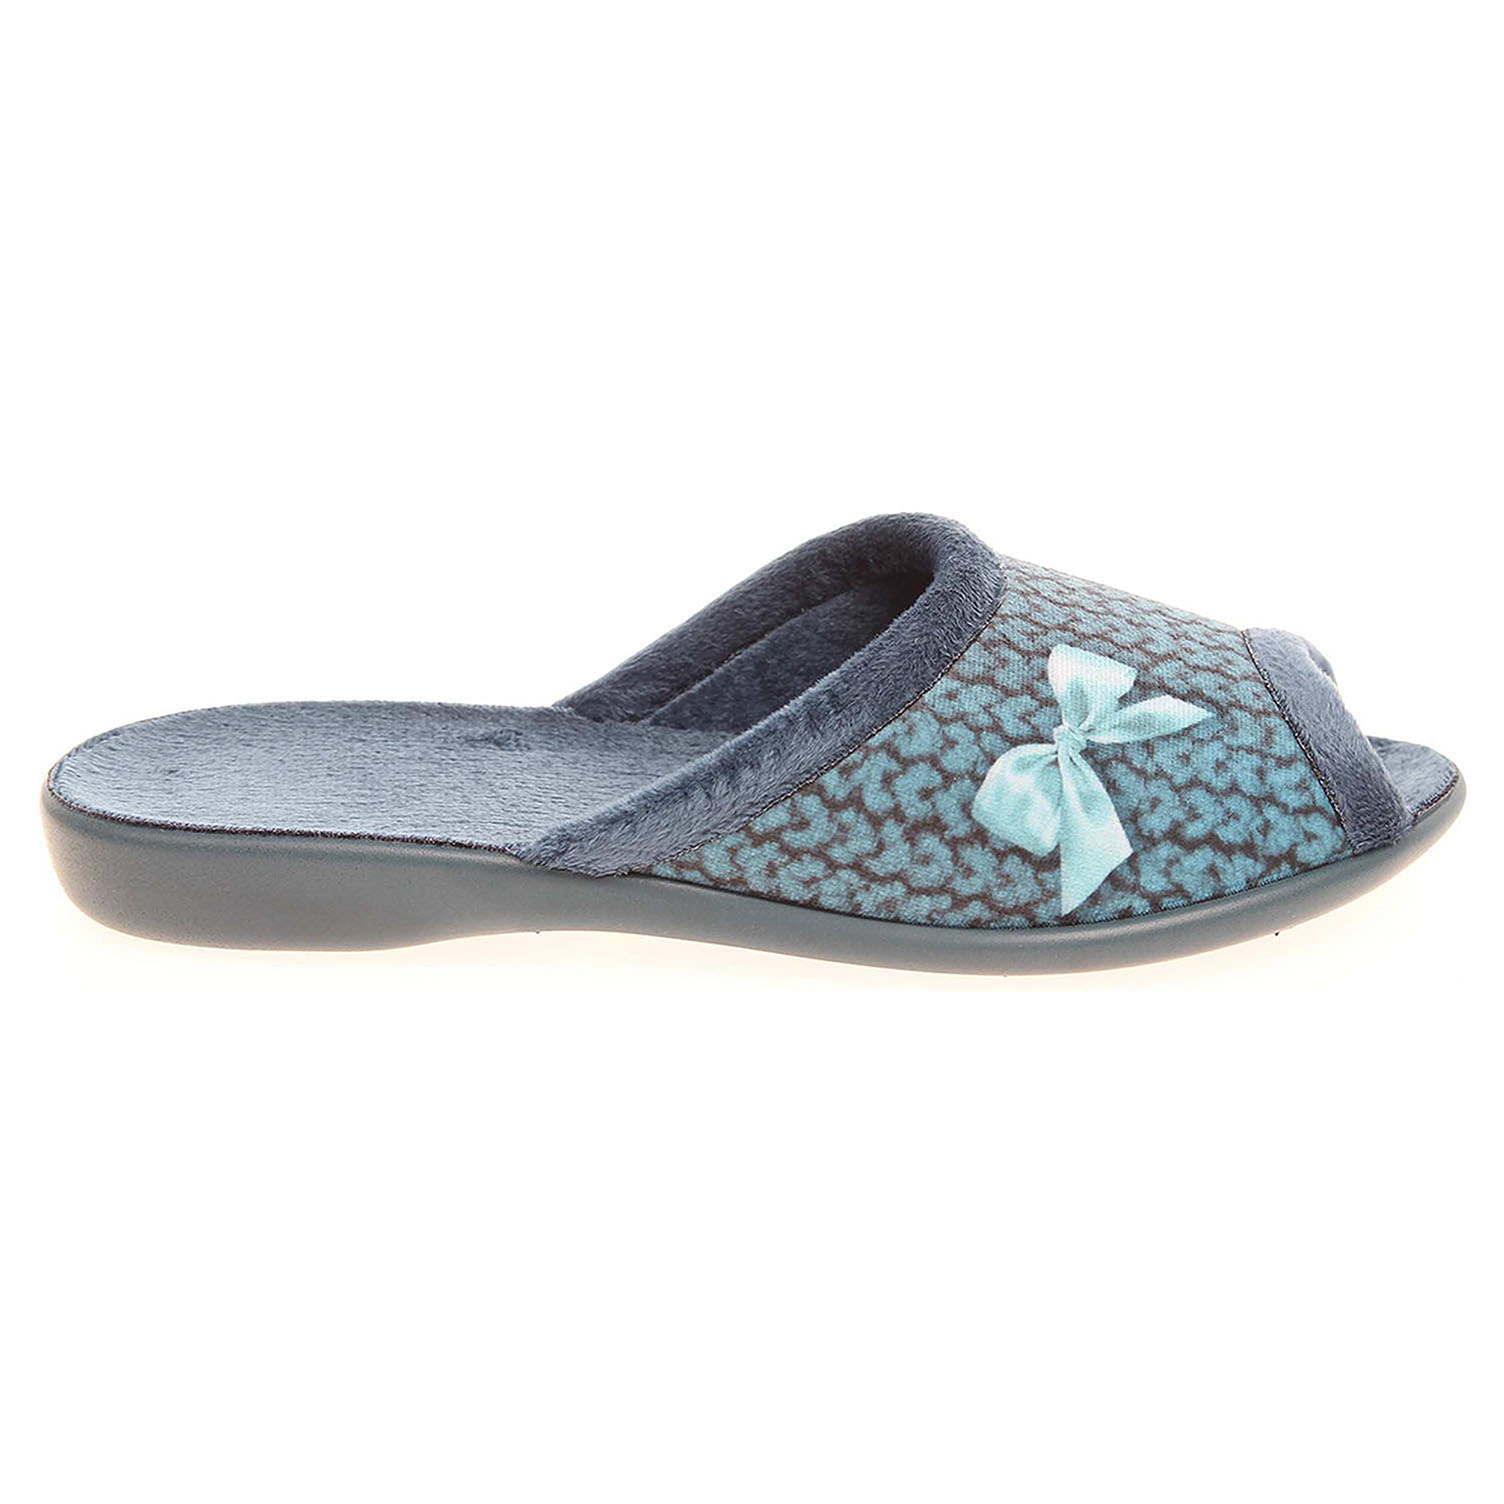 Ecco Befado domácí pantofle 254D069 modré 23500515